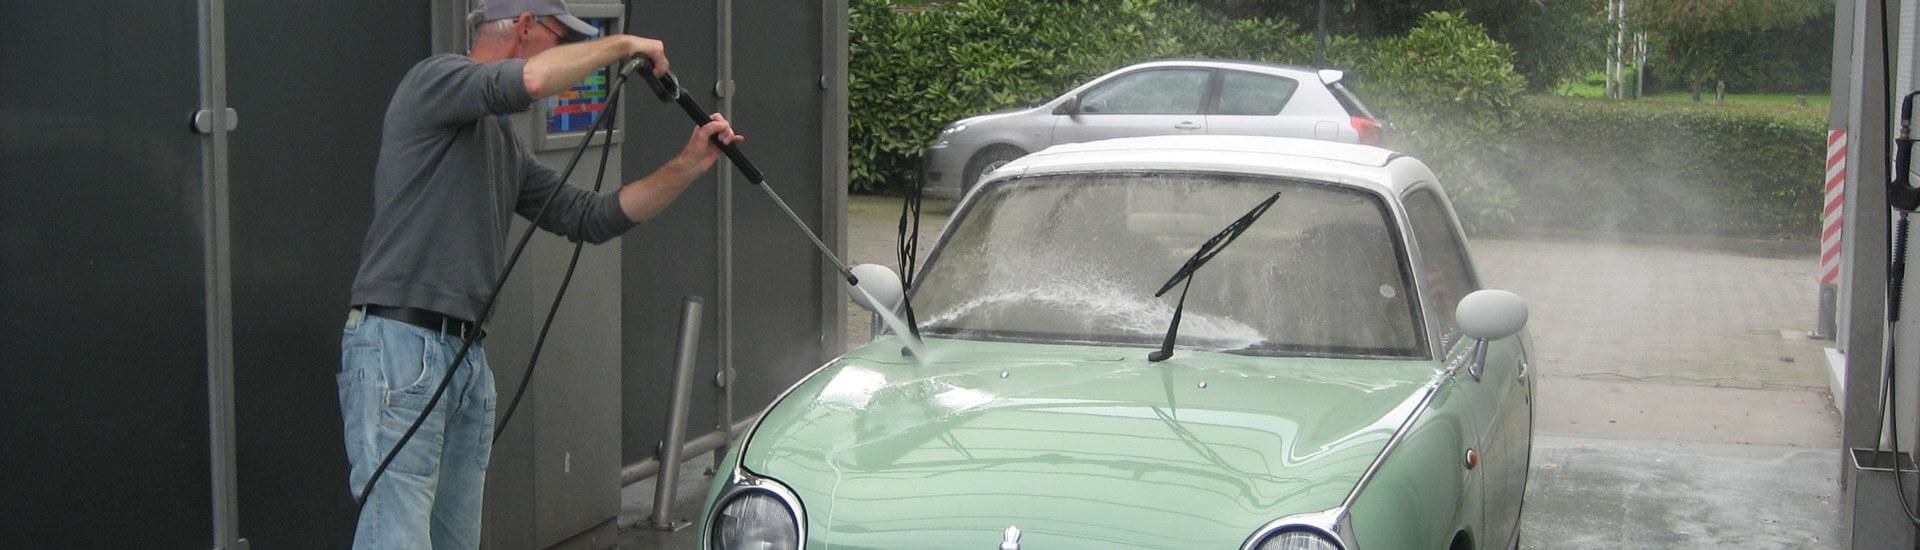 Autowasboxen Hollandse Kade Abcoude